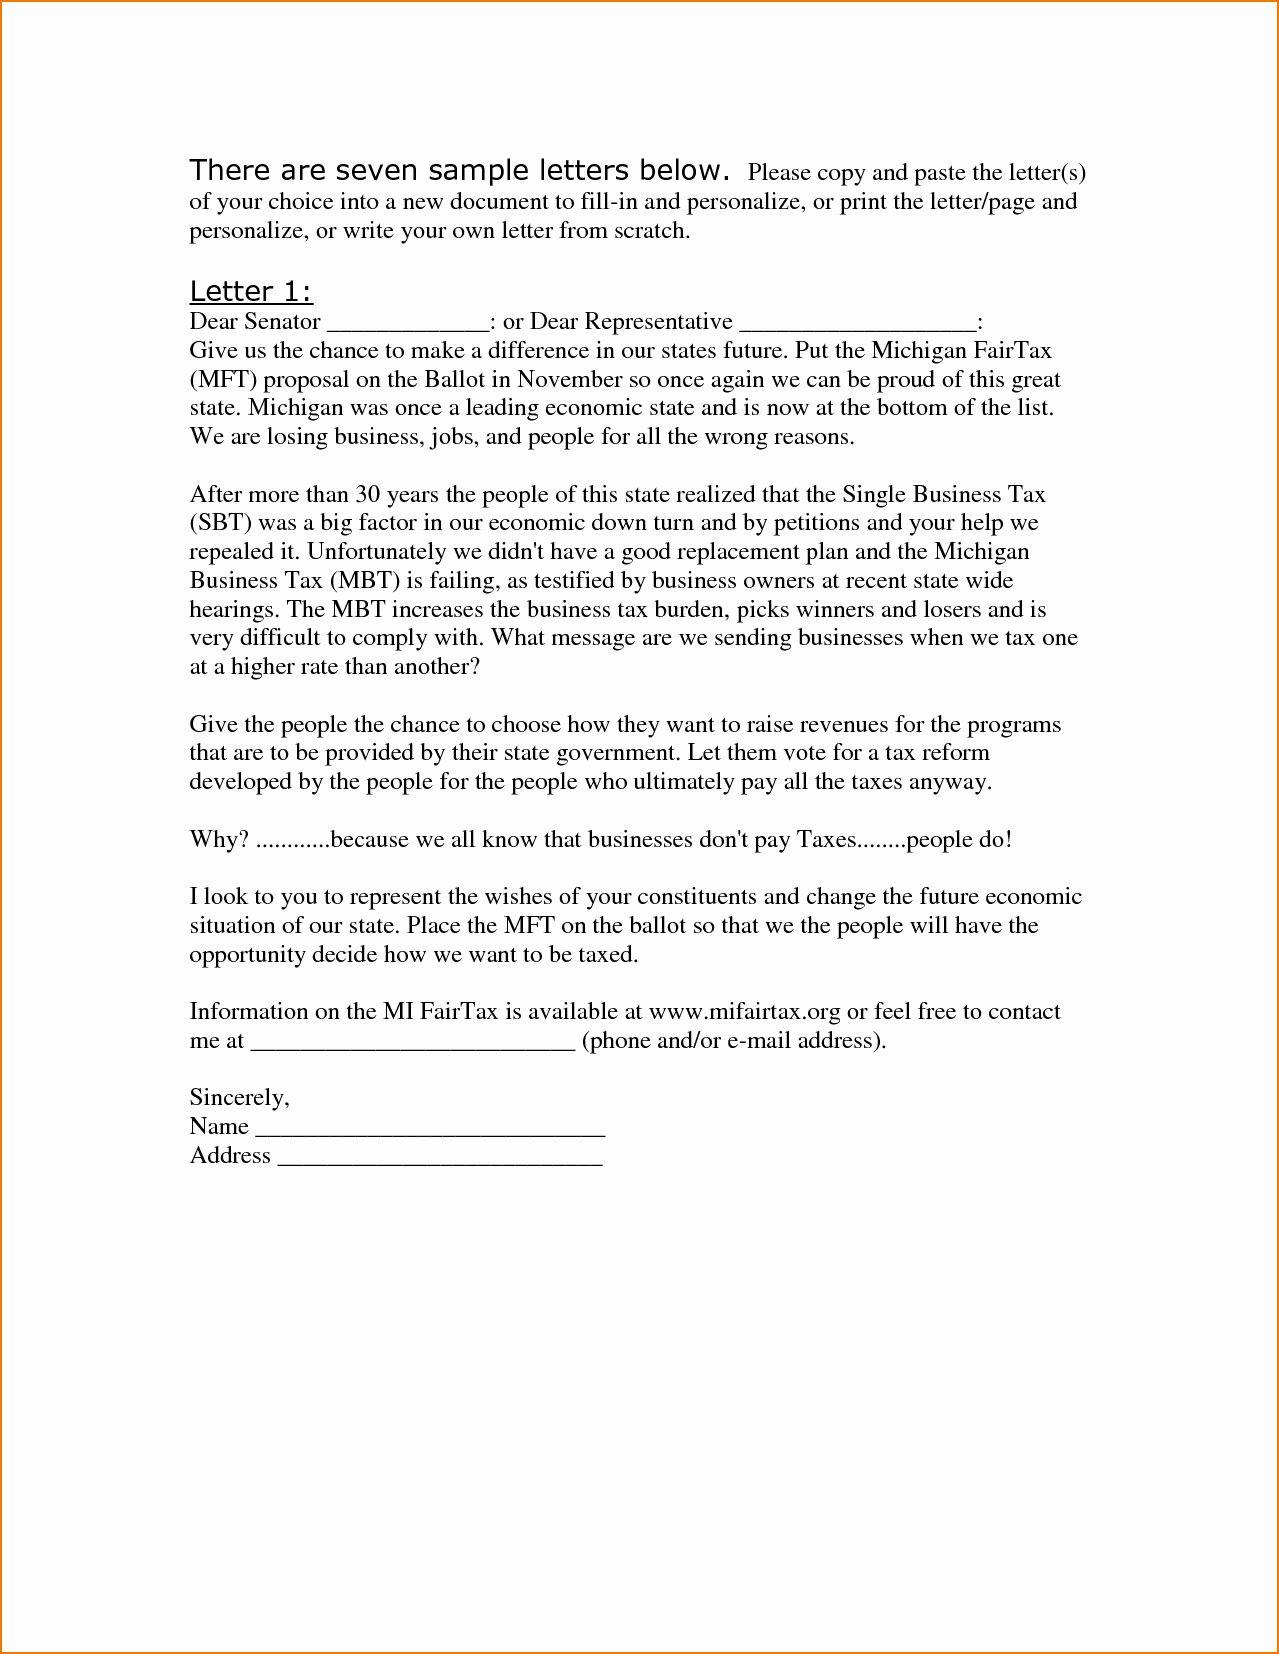 Sample Business Proposal Letter For Partnership Best Of 5 Sample Business Proposal Letter Business Proposal Letter Proposal Letter Business Proposal Sample